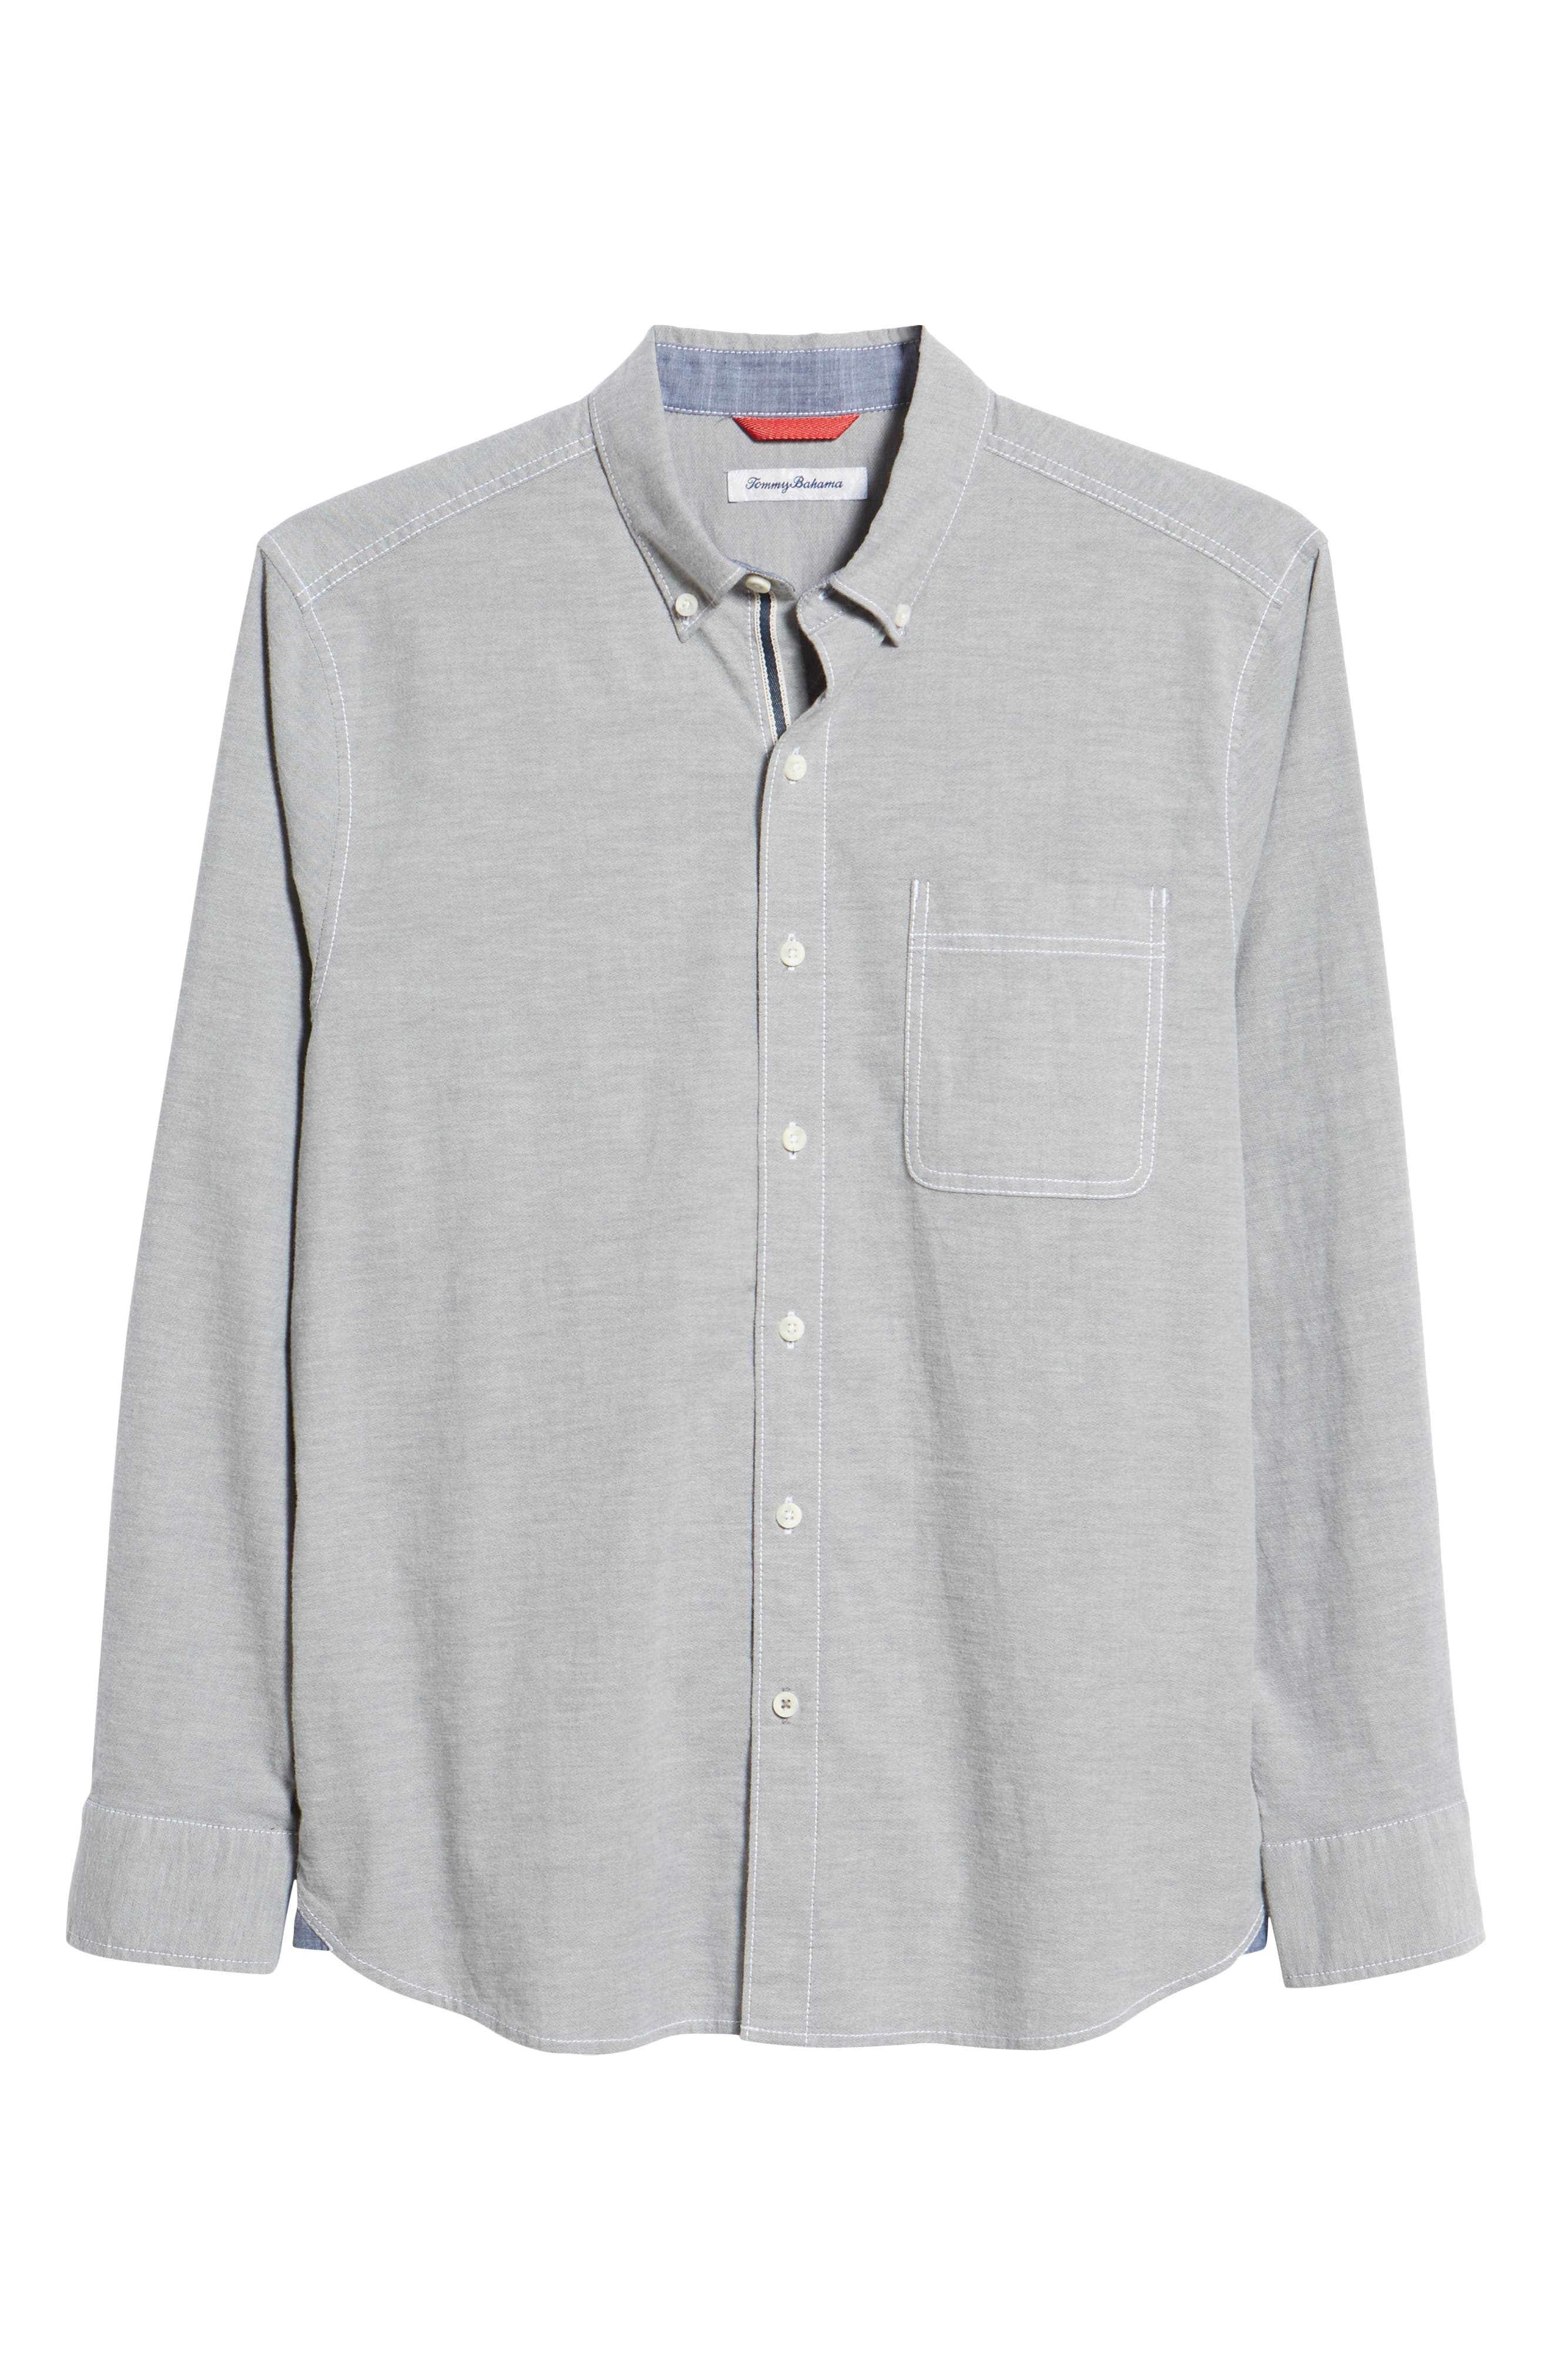 Oxford Isles Sport Shirt,                             Alternate thumbnail 5, color,                             CAVE